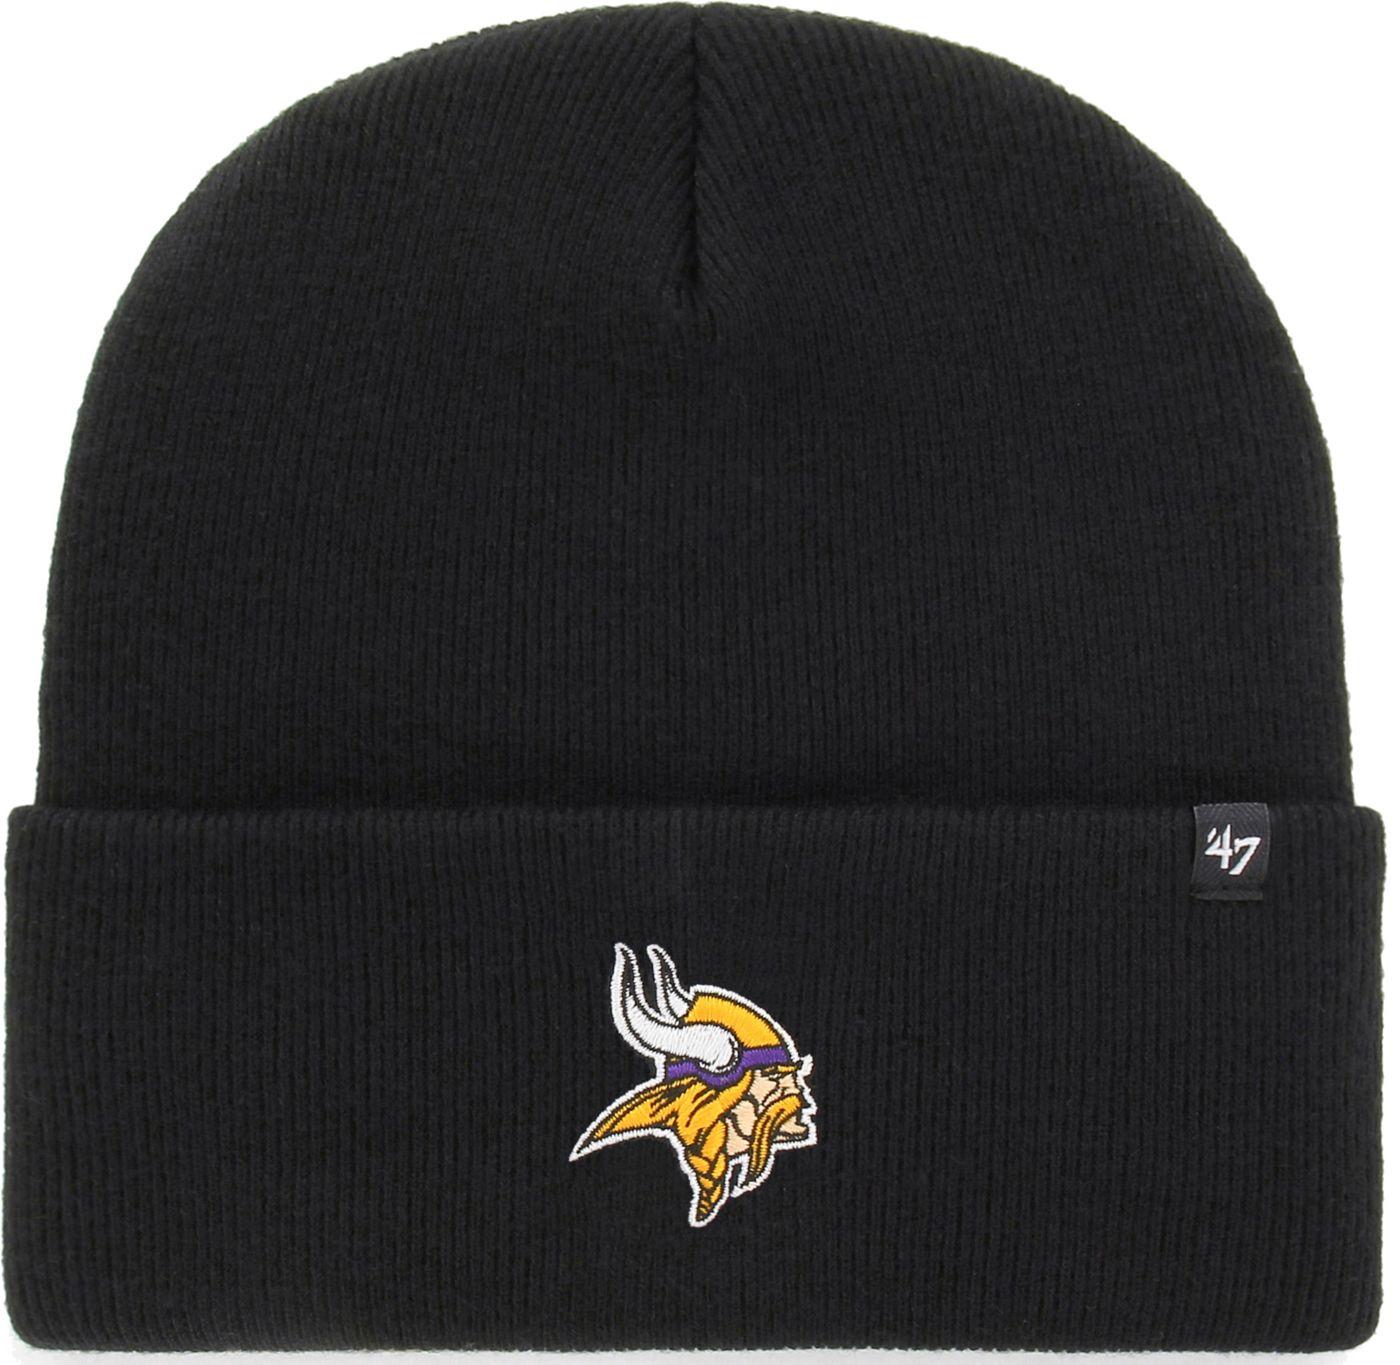 '47 Men's Minnesota Vikings Carhartt Black Knit Hat